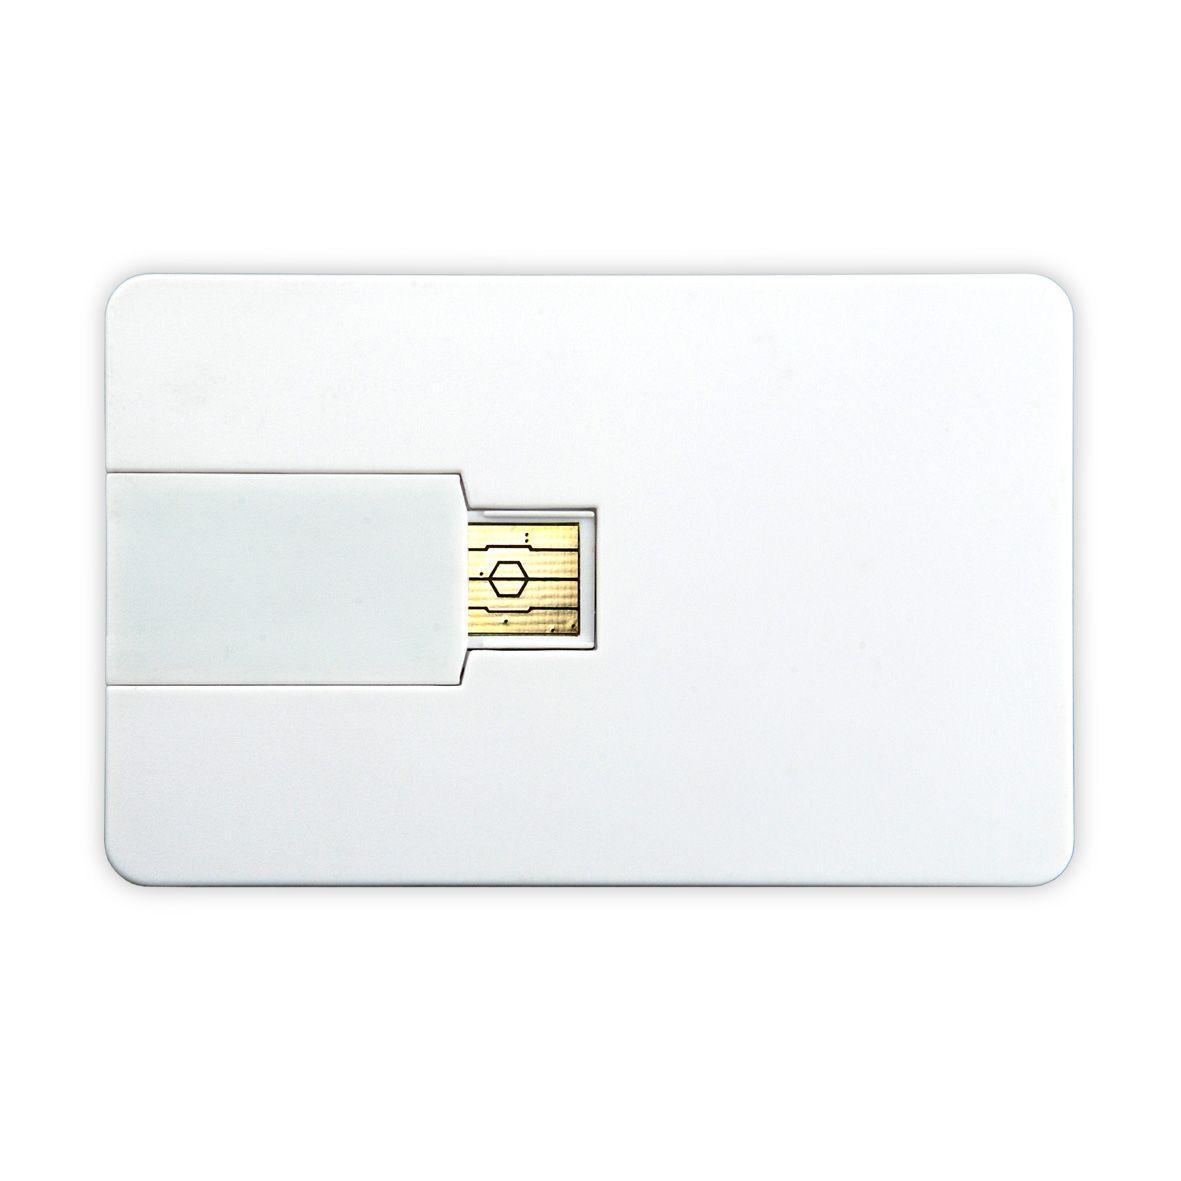 Usb card free mockup templates pinterest mockup business usb card magicingreecefo Gallery